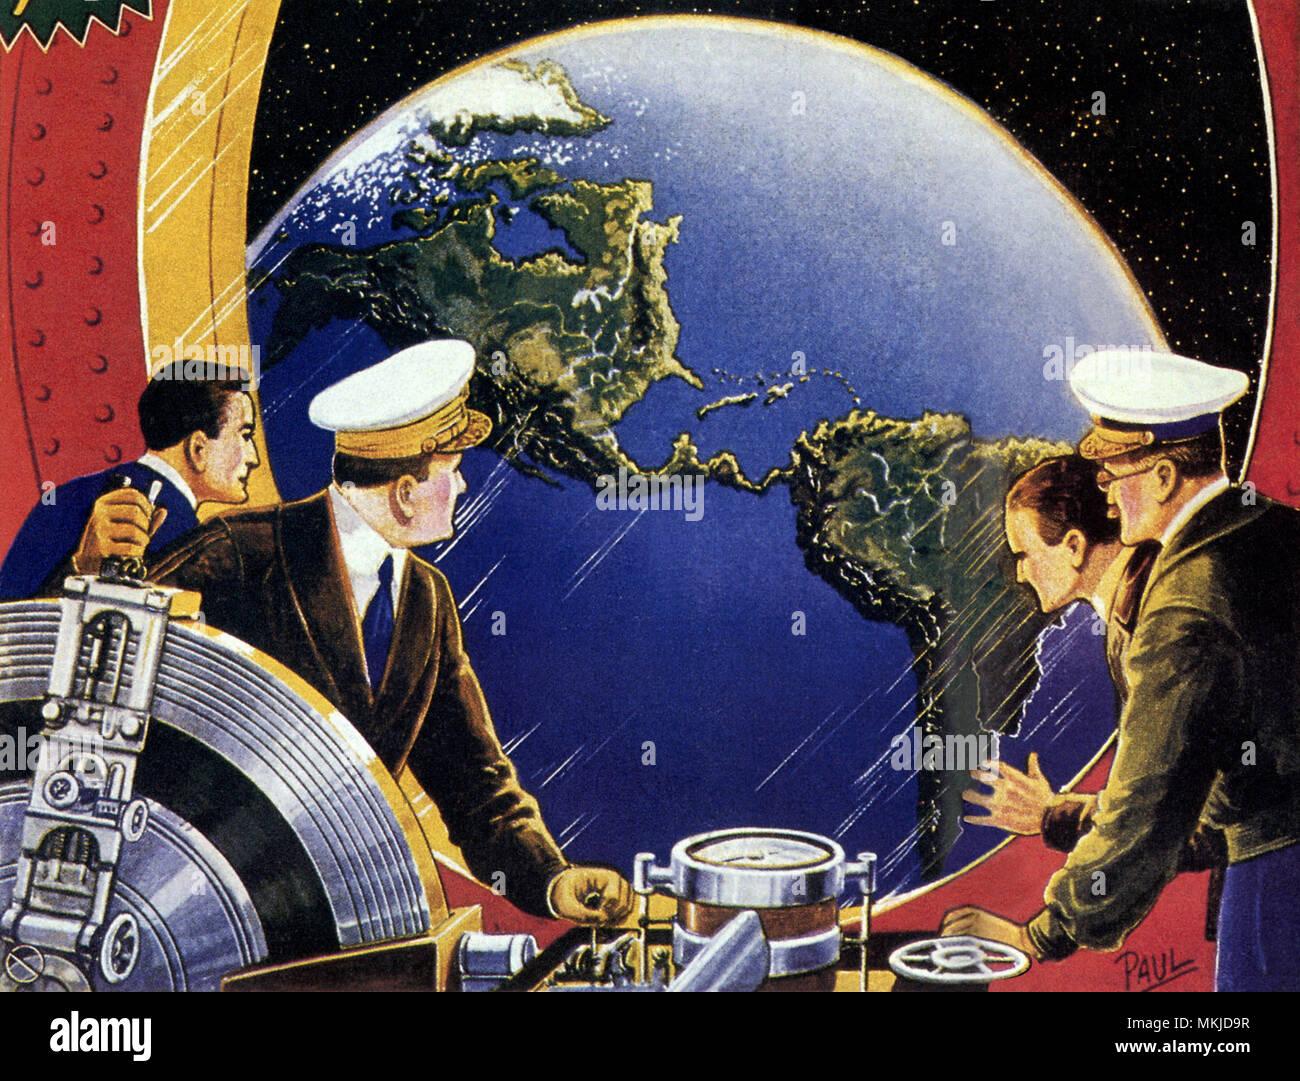 Sci Fi - Steering Spaceship - Stock Image